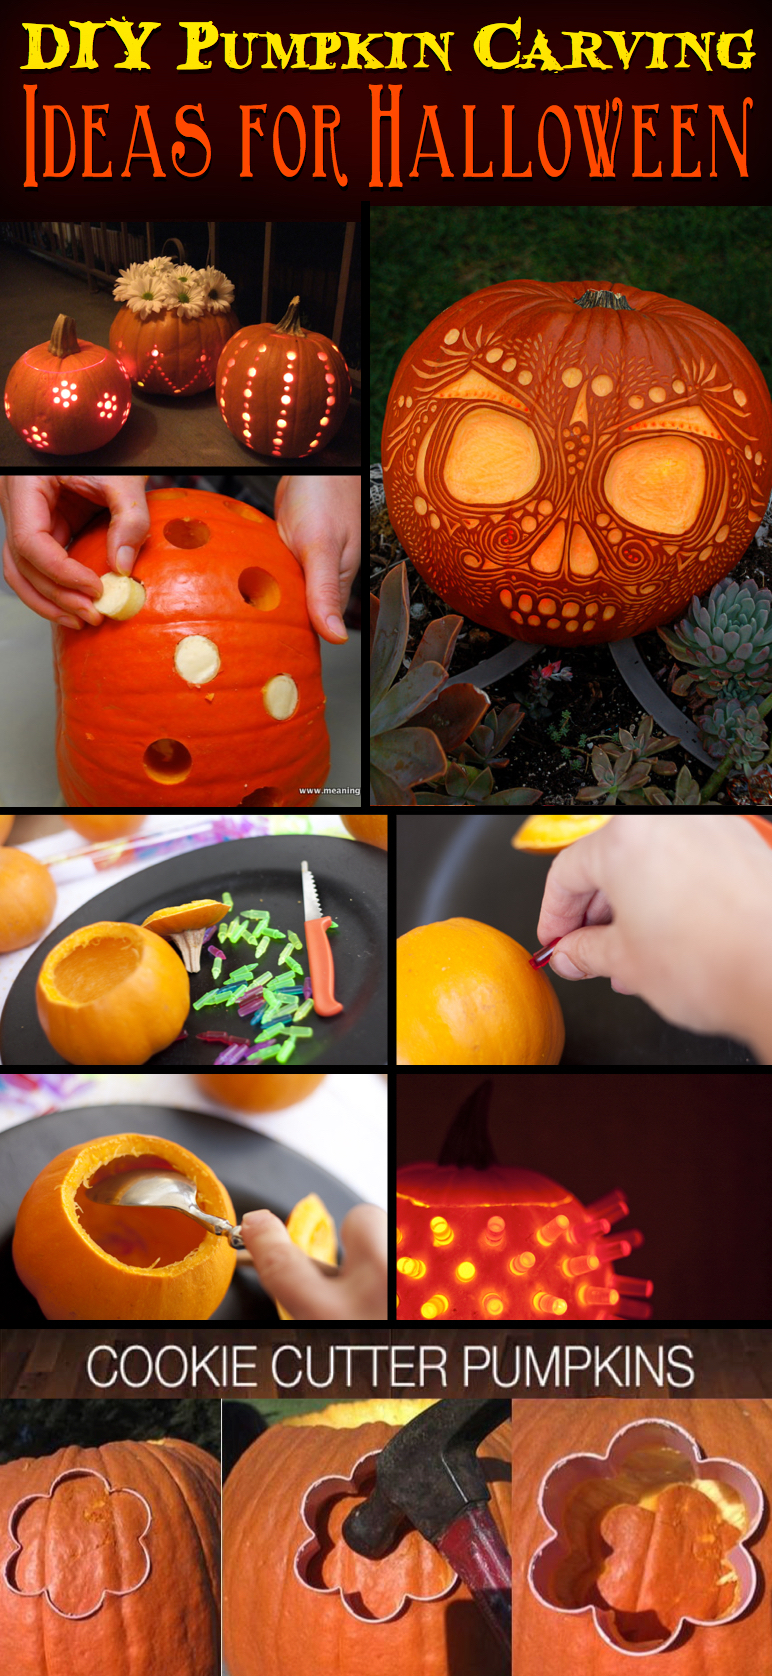 60 Easy Cool Diy Pumpkin Carving Ideas For Halloween 2018